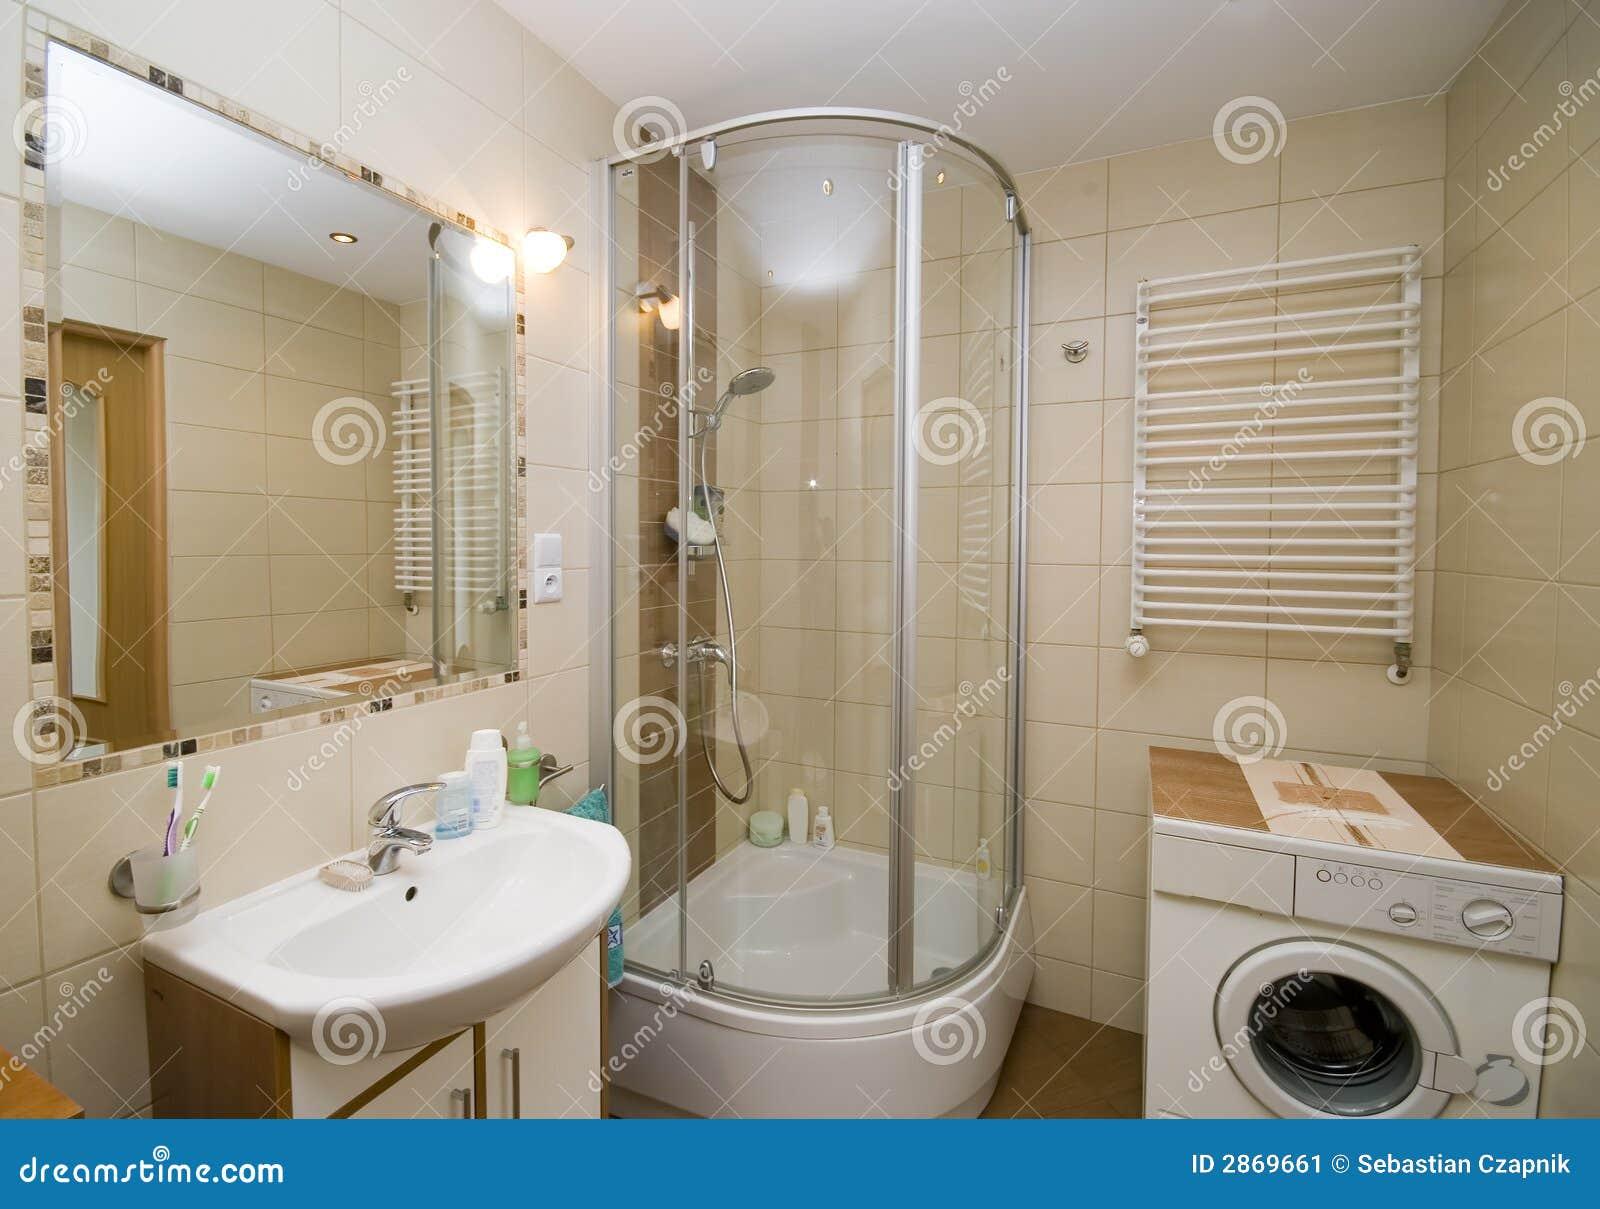 Bathroom inside